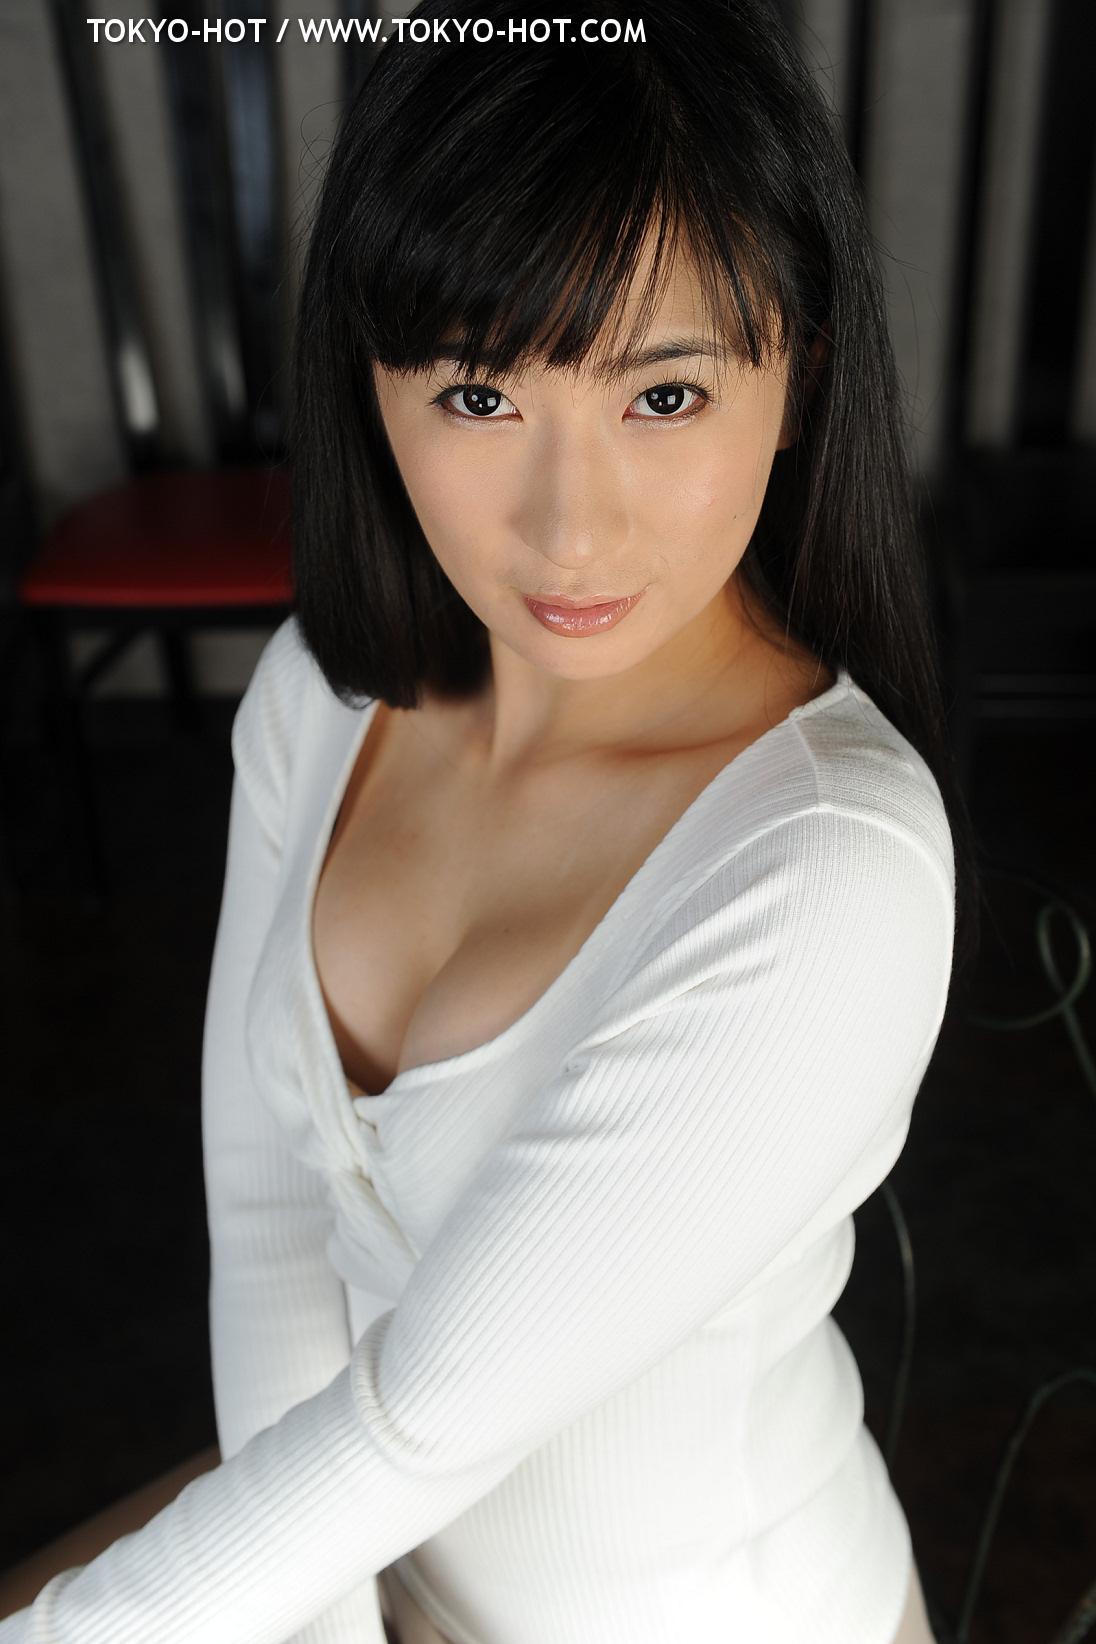 [Tokyo-Hot] 2017-09-07 e1156 RiovKobayashi 小林莉緒 [803P401MB]